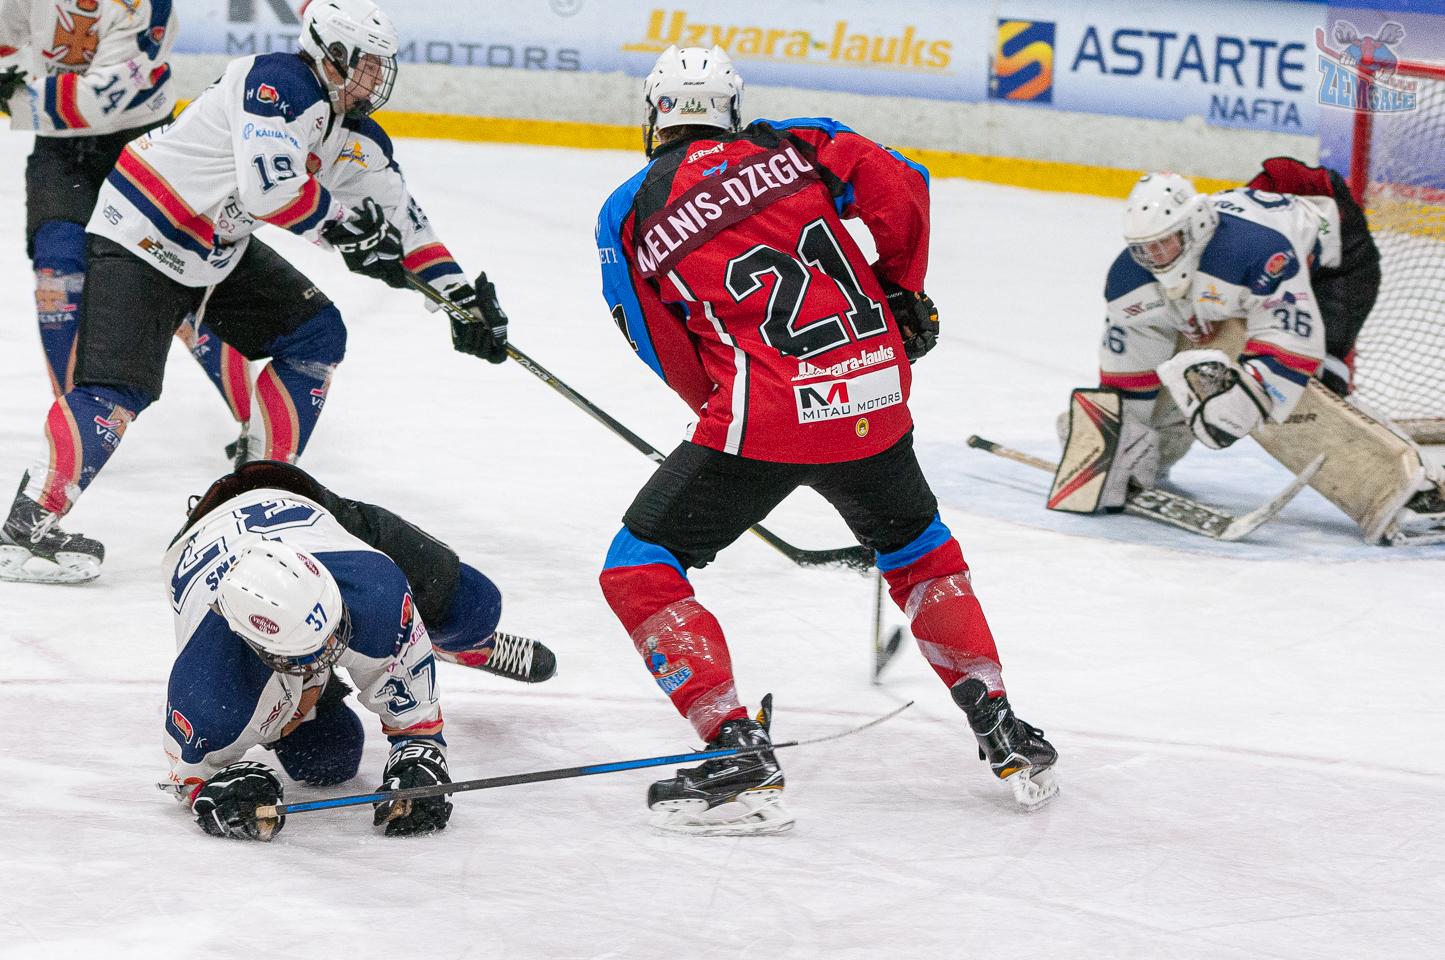 Jelgavas hokeja skola JLSS U17 - Venta 2002 14092019-16